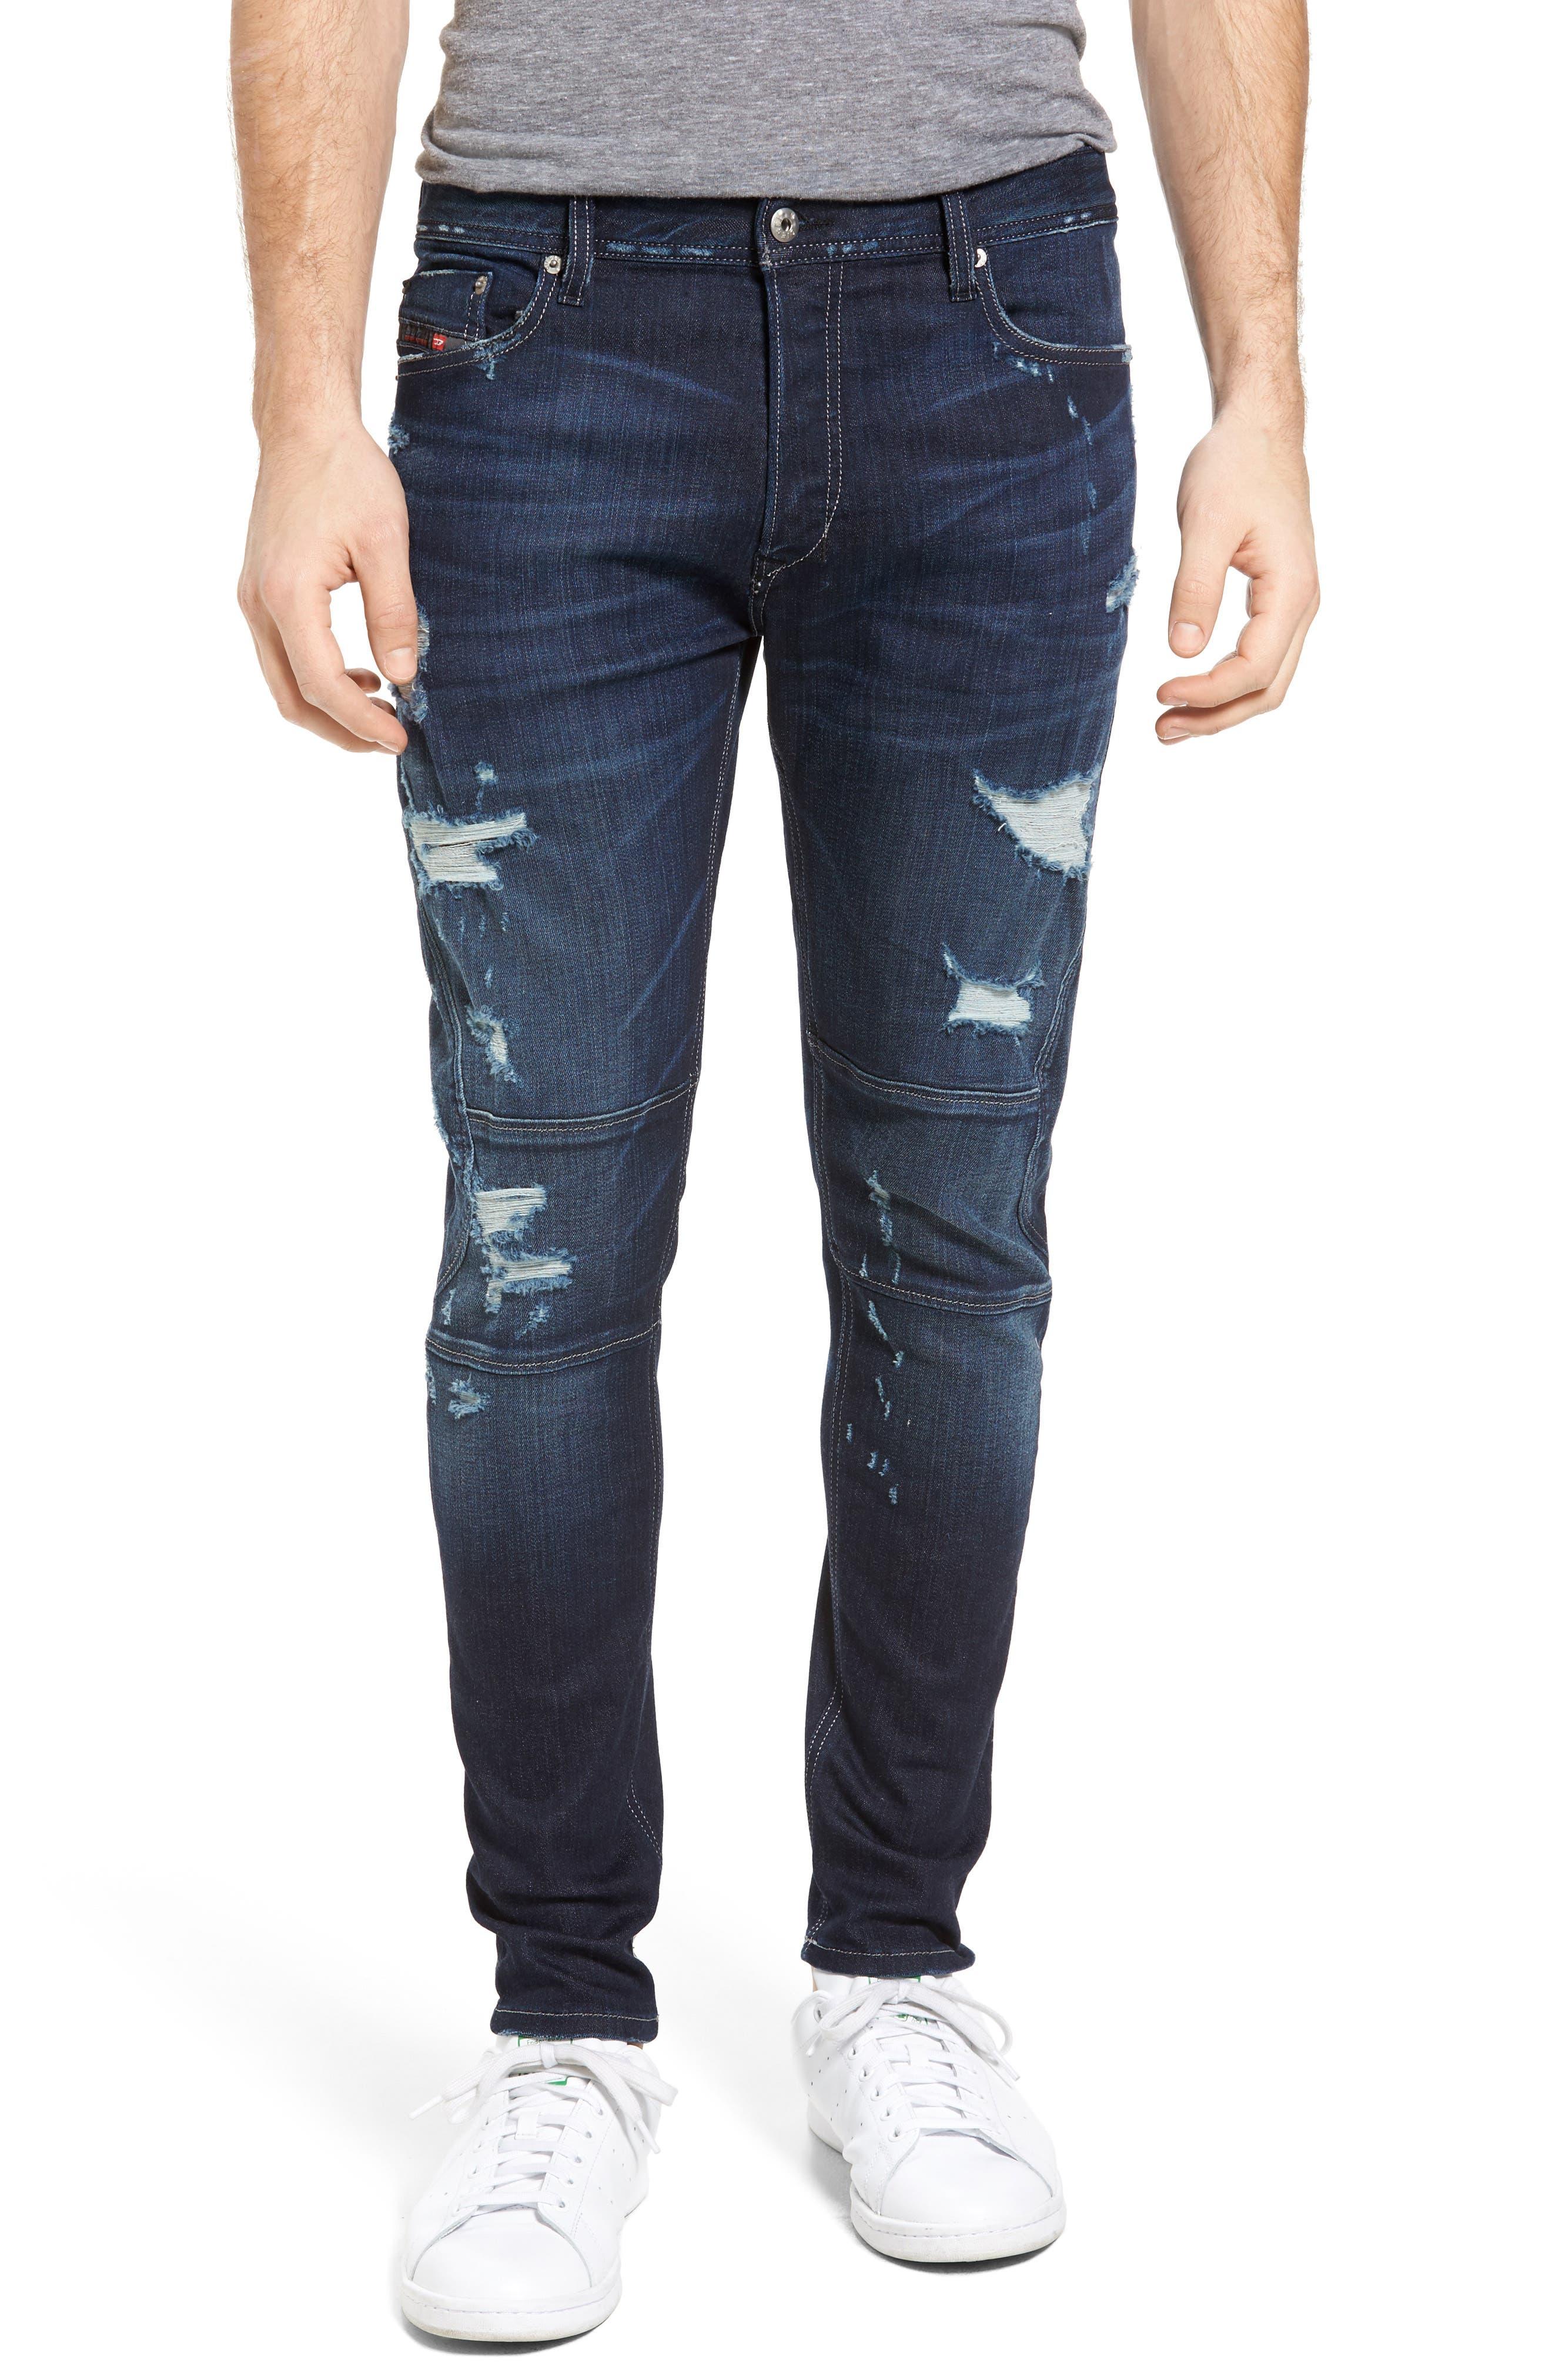 T-Ride Skinny Fit Moto Jeans,                             Main thumbnail 1, color,                             400